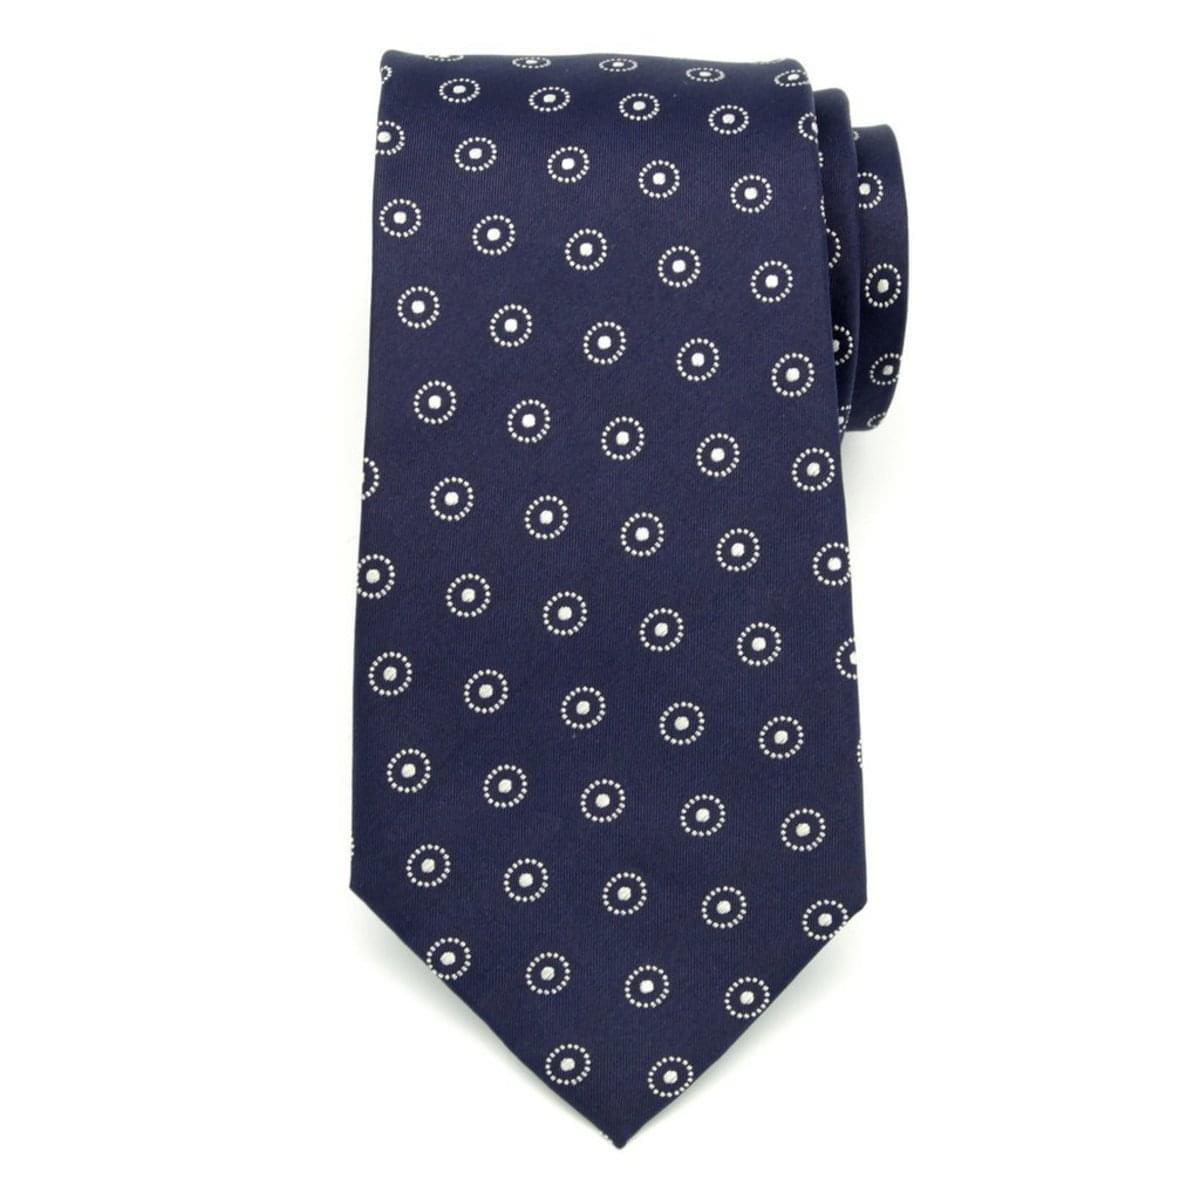 Hedvábná kravata (vzor 256)4109